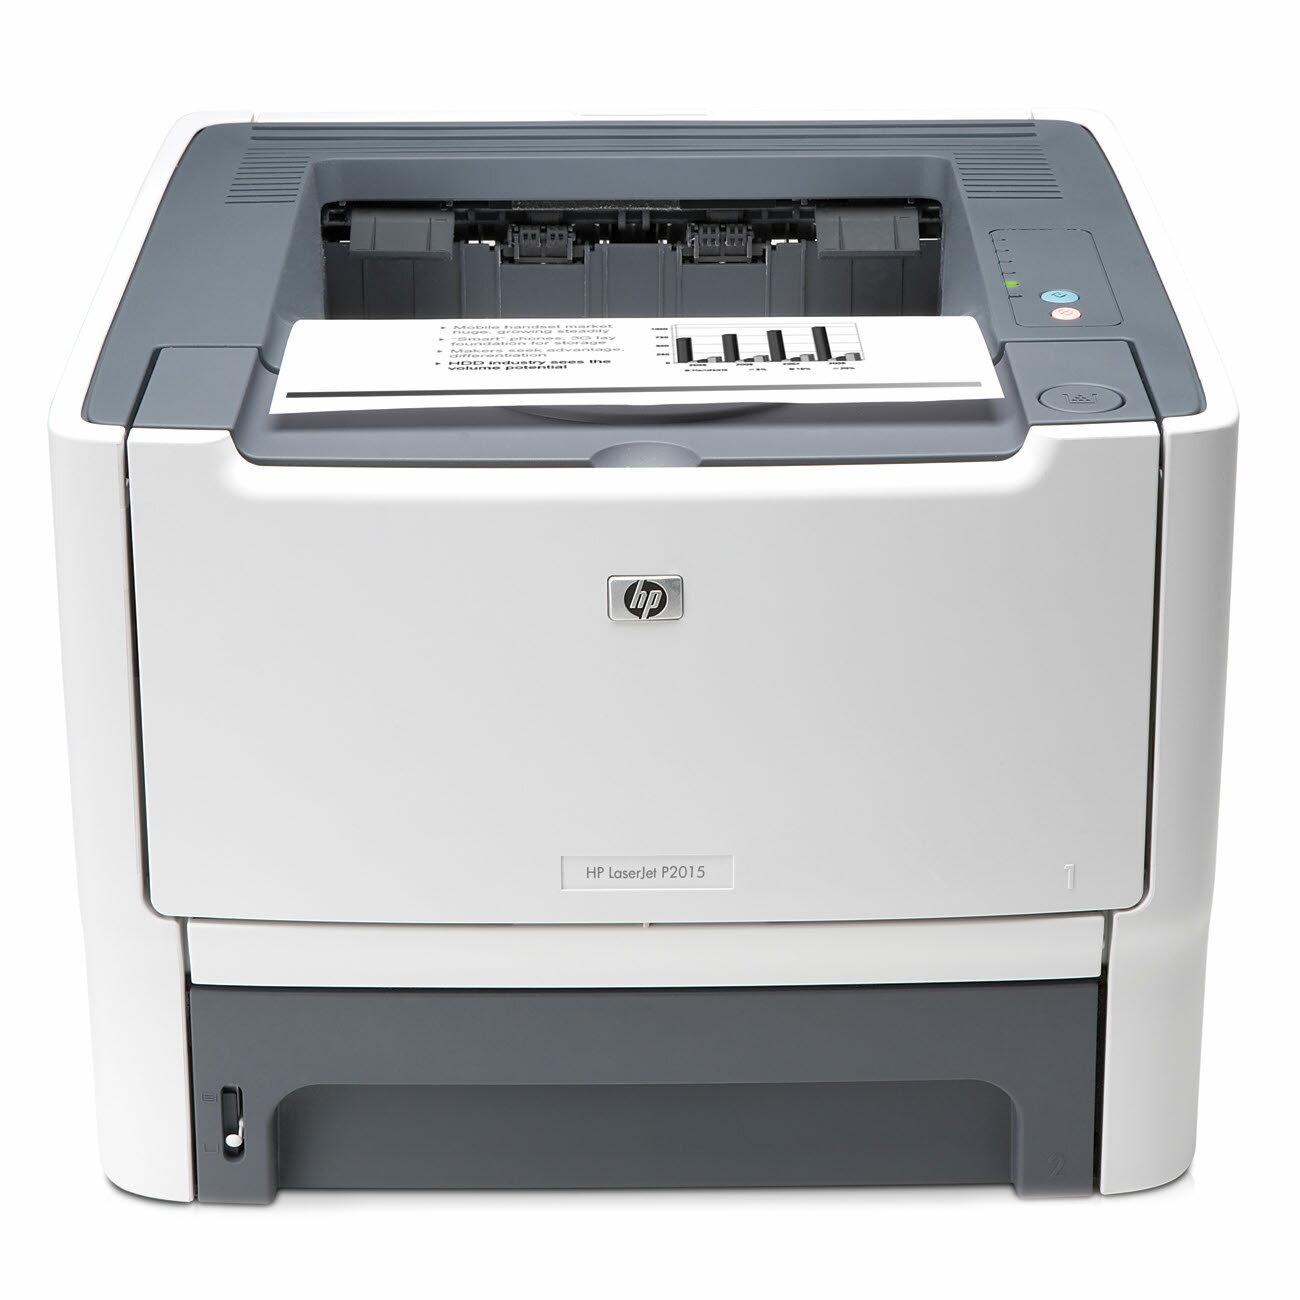 HP LaserJet P2000 P2015D Laser Printer - Monochrome - 1200 x 1200 dpi Print - Plain Paper Print - Desktop - 27 ppm Mono Print - Legal, Executive, Envelope No. 10, Monarch Envelope, Custom Size - 300 sheets Standard Input Capacity - 15000 Duty Cycle - Auto 0